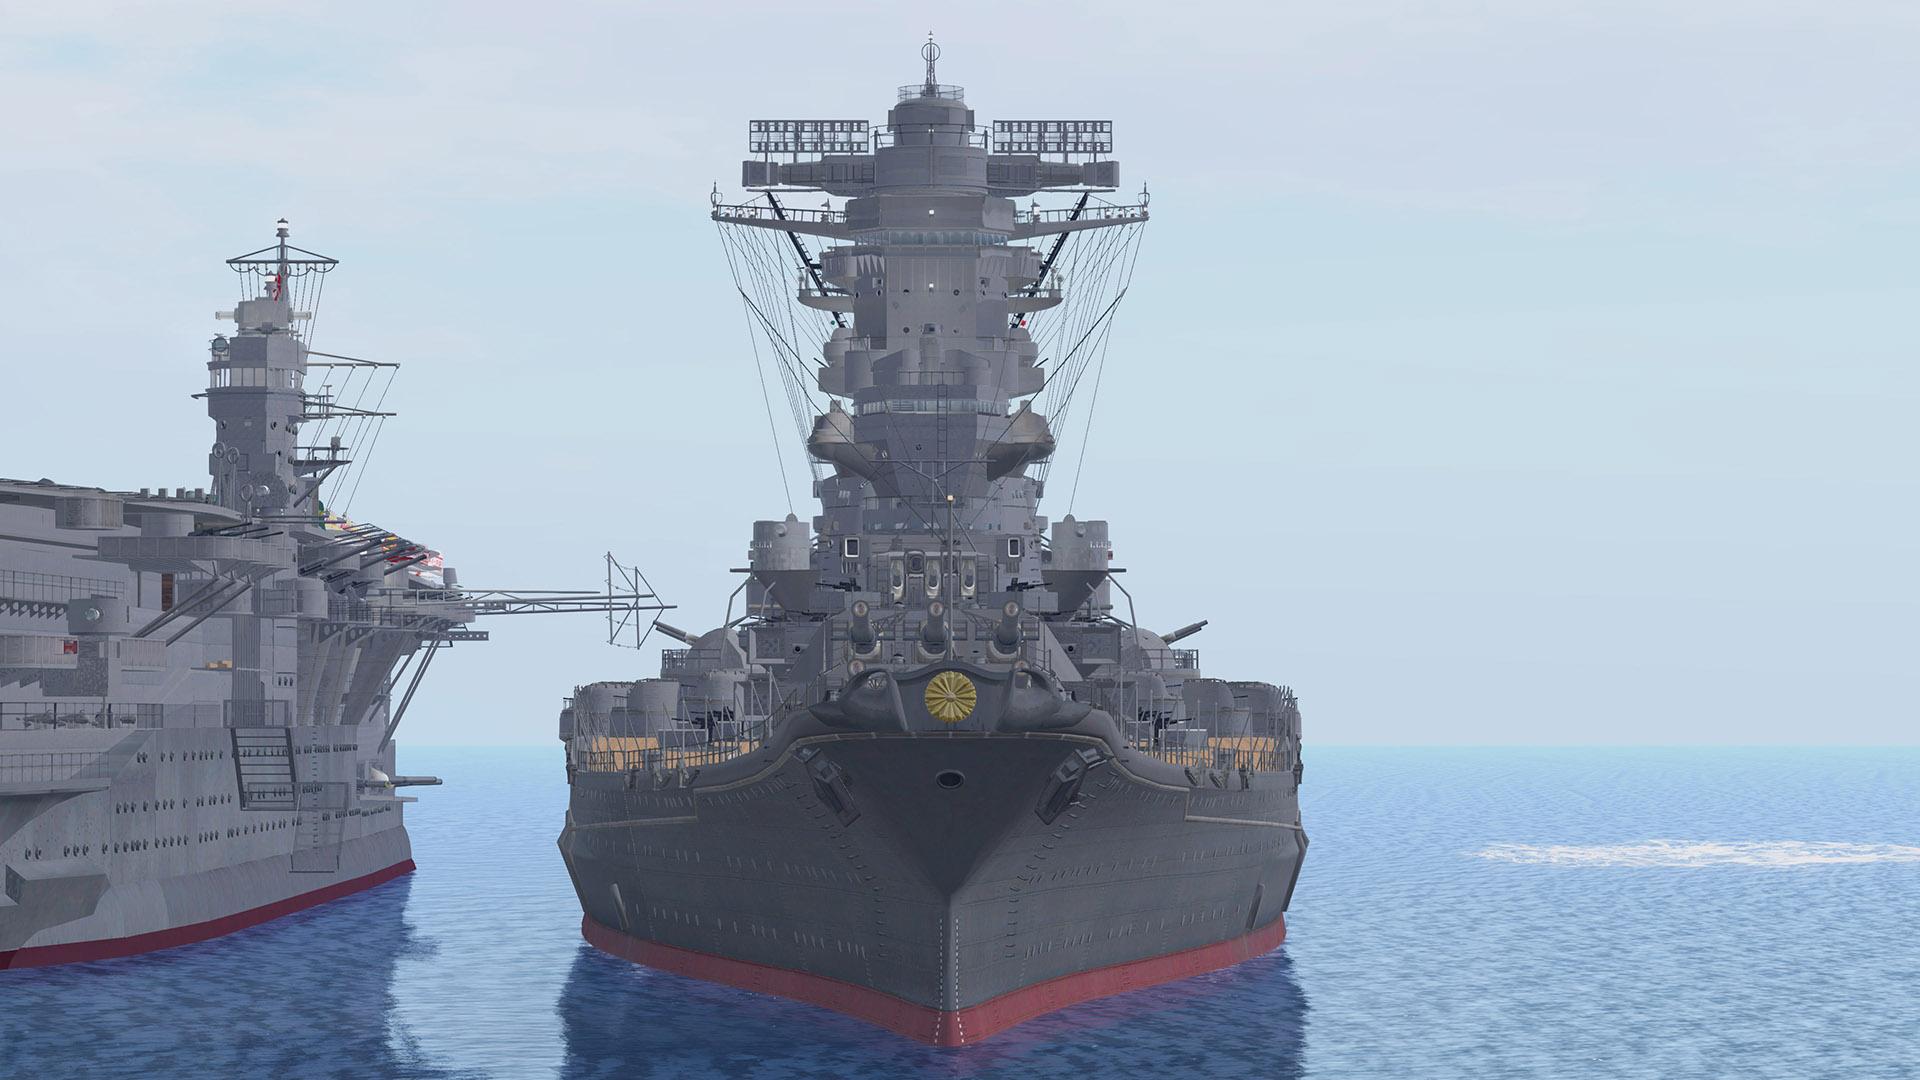 Cafeシンデレラ 実寸大の戦艦大和と空母赤城が復活です Site Name Add